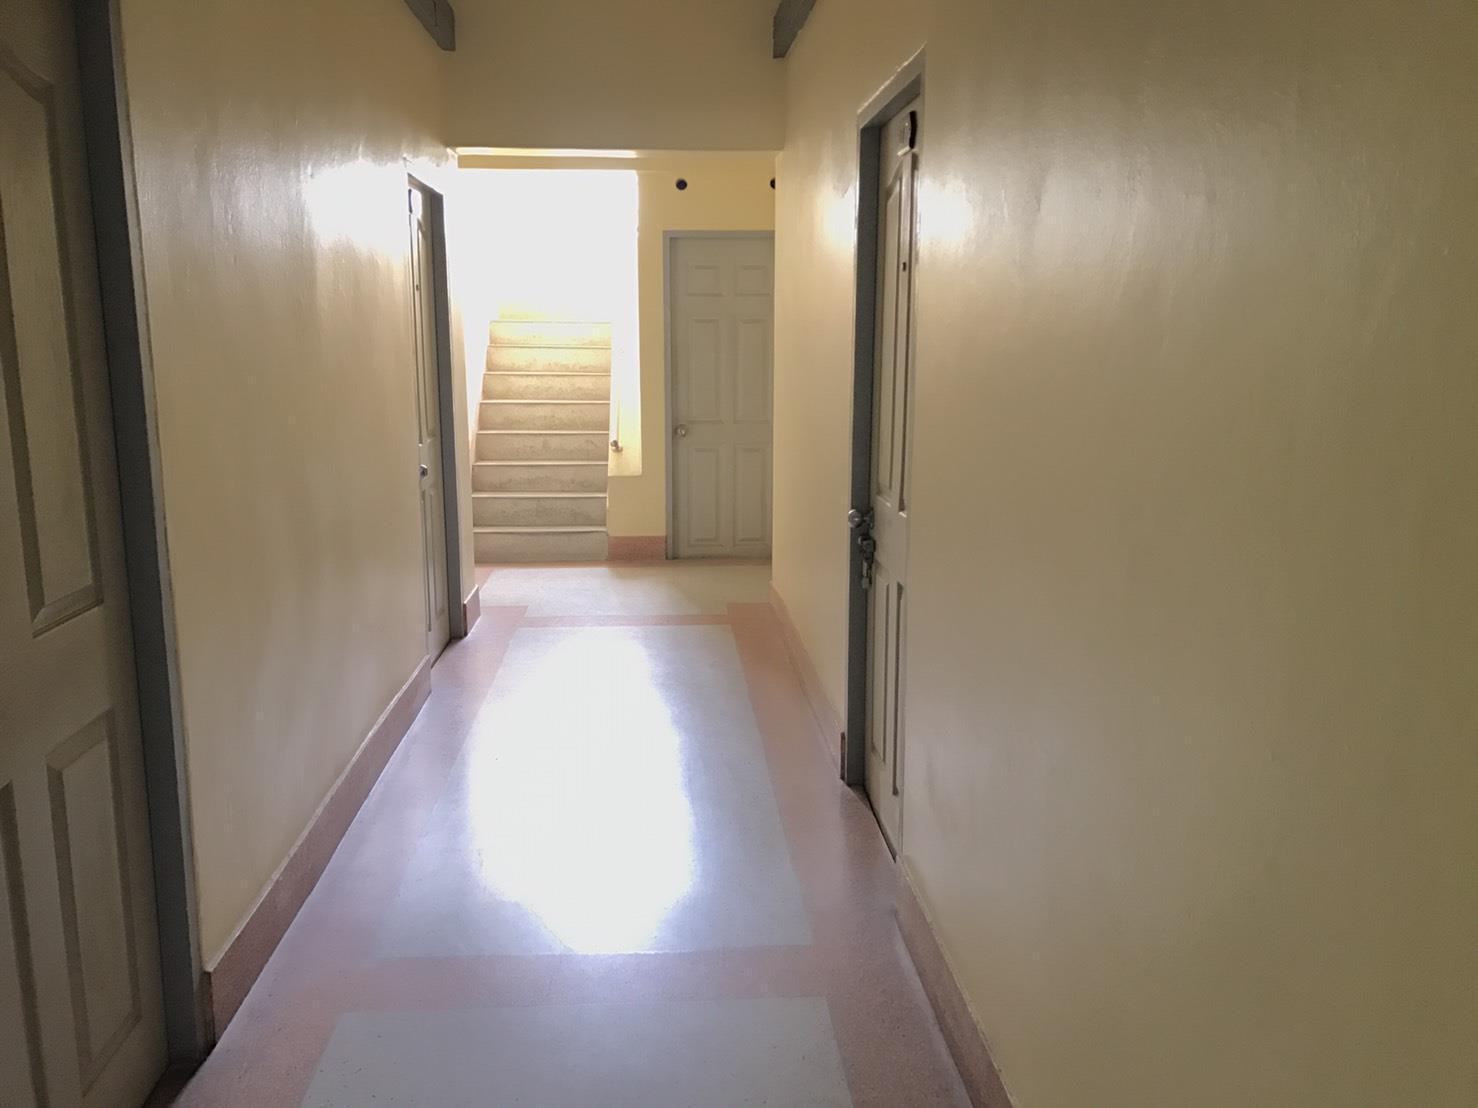 Hugoplace Apartment ฮิวโกเพลส อพาร์ตเมนท์